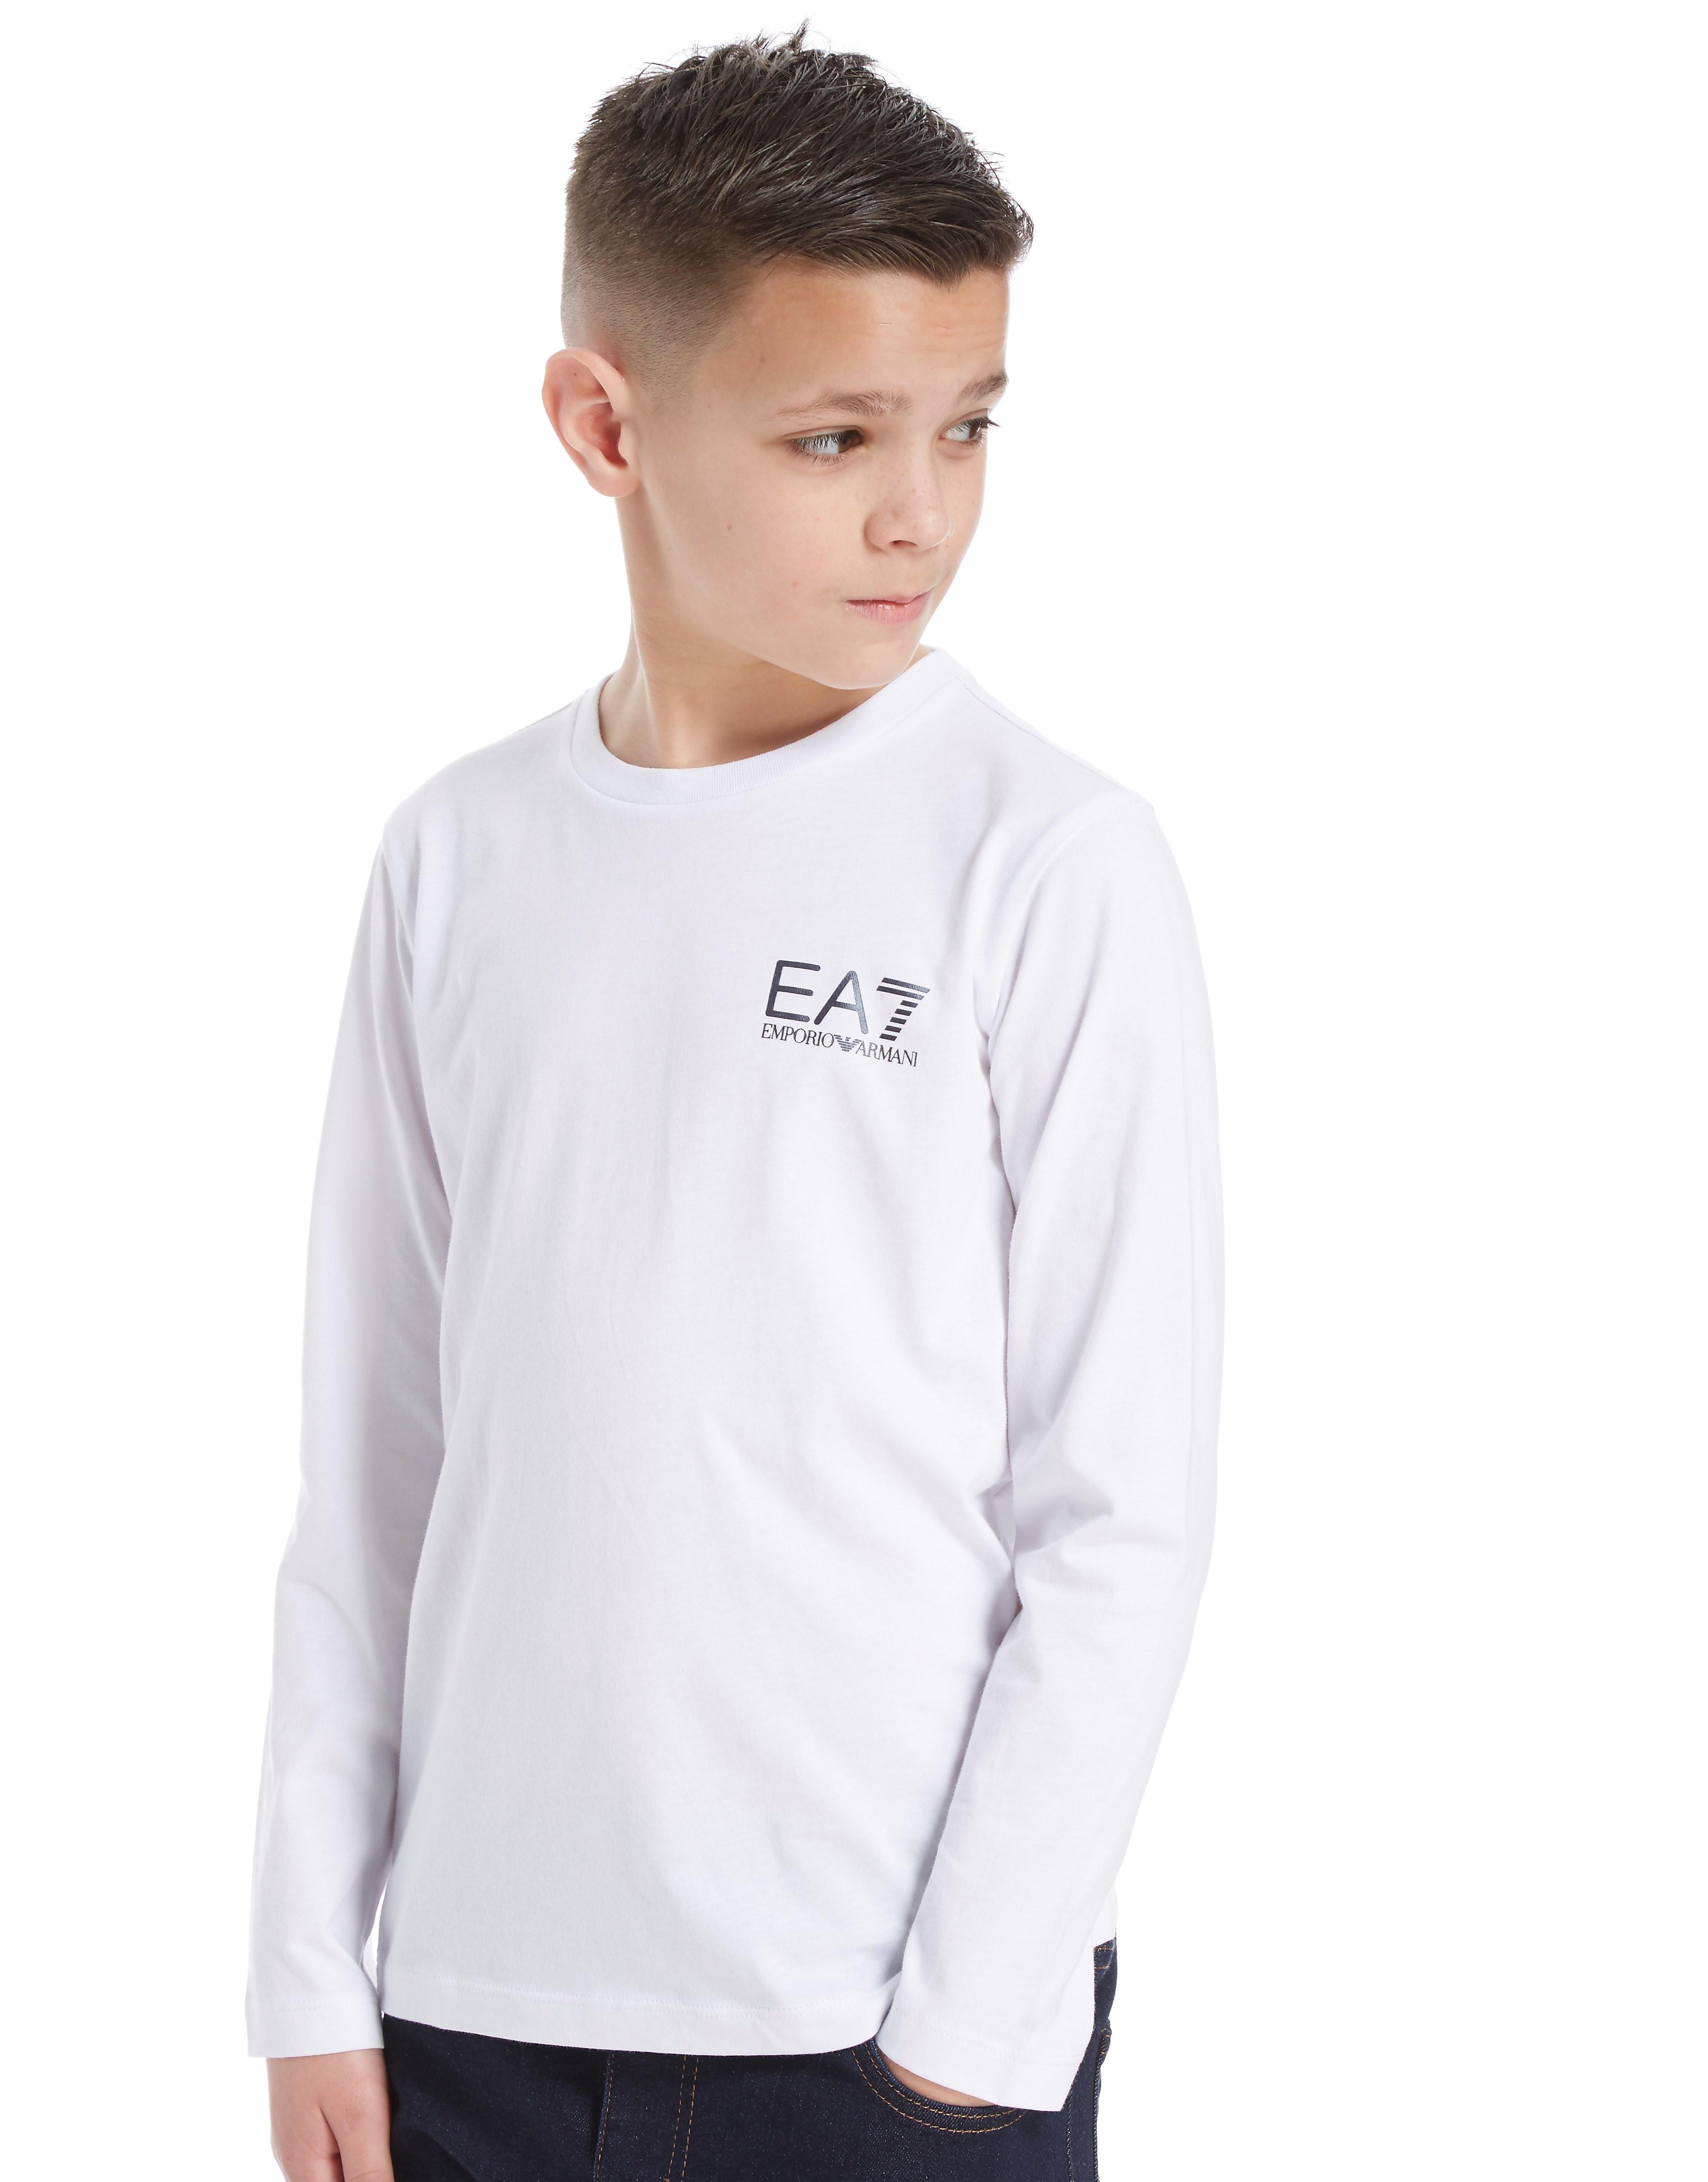 Emporio Armani EA7 Core Logo Long Sleeve T-Shirt Junior